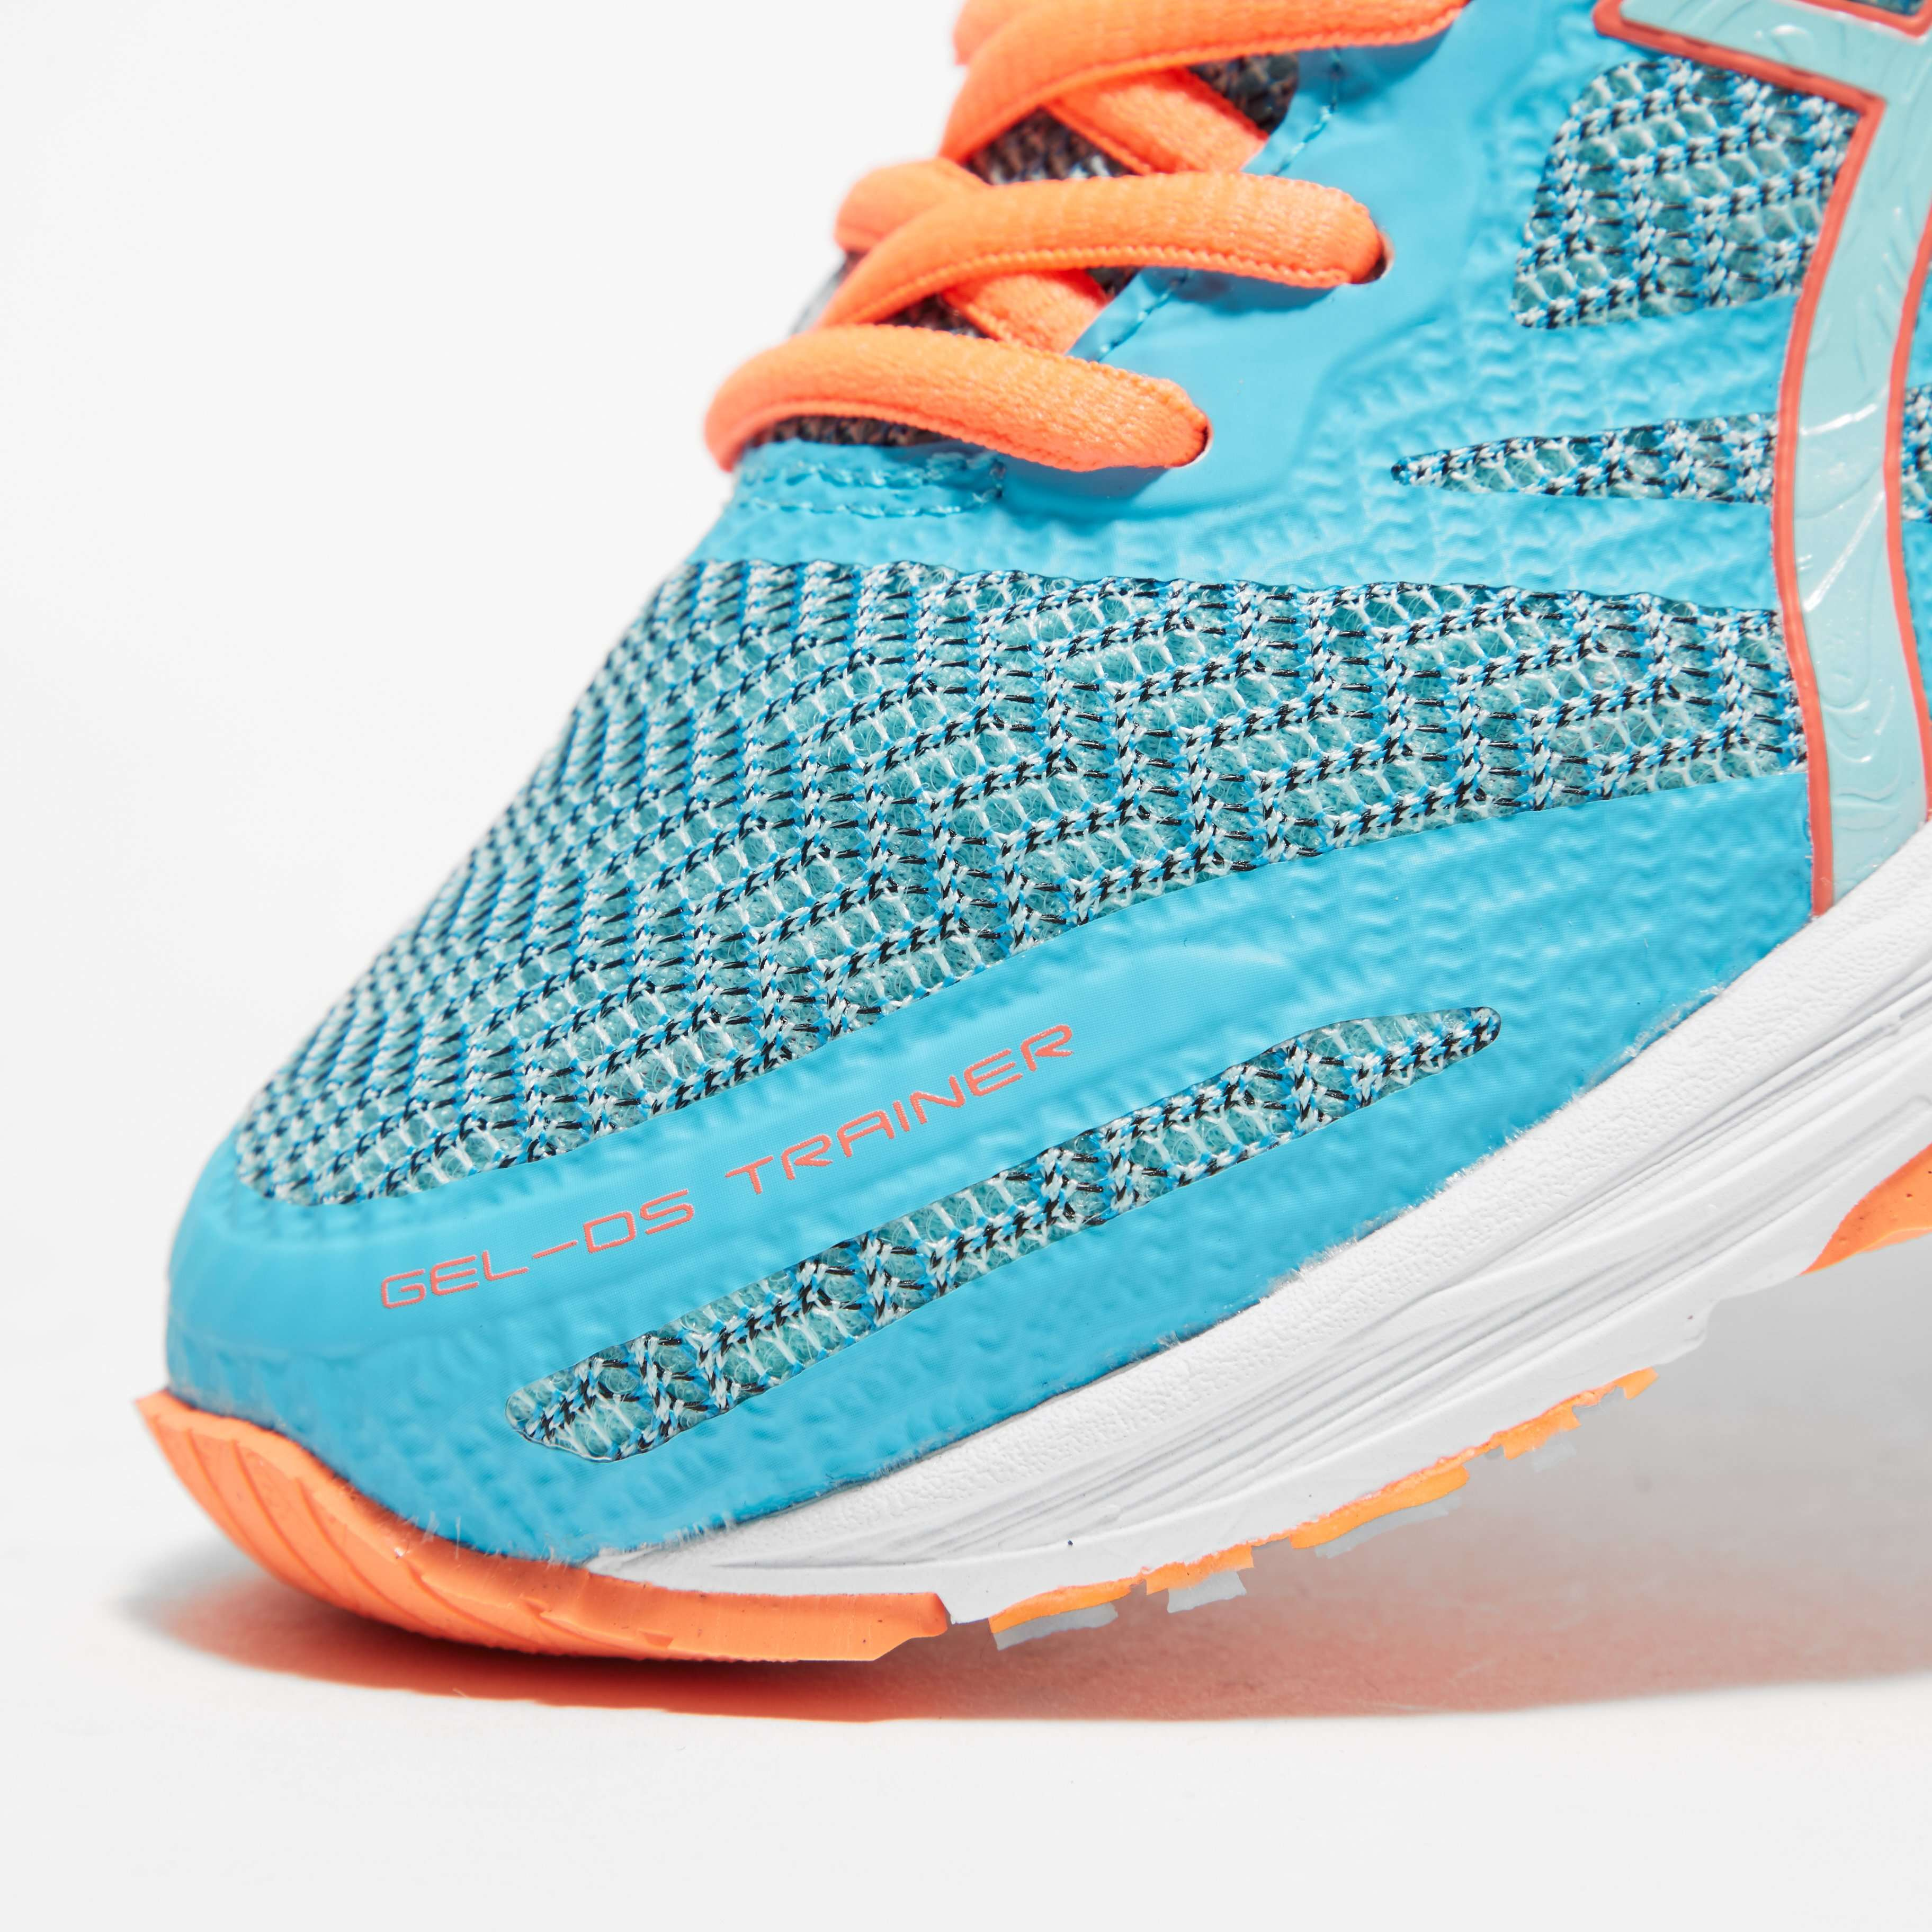 ASICS GEL-DS Trainer 22 Women's Running Shoes